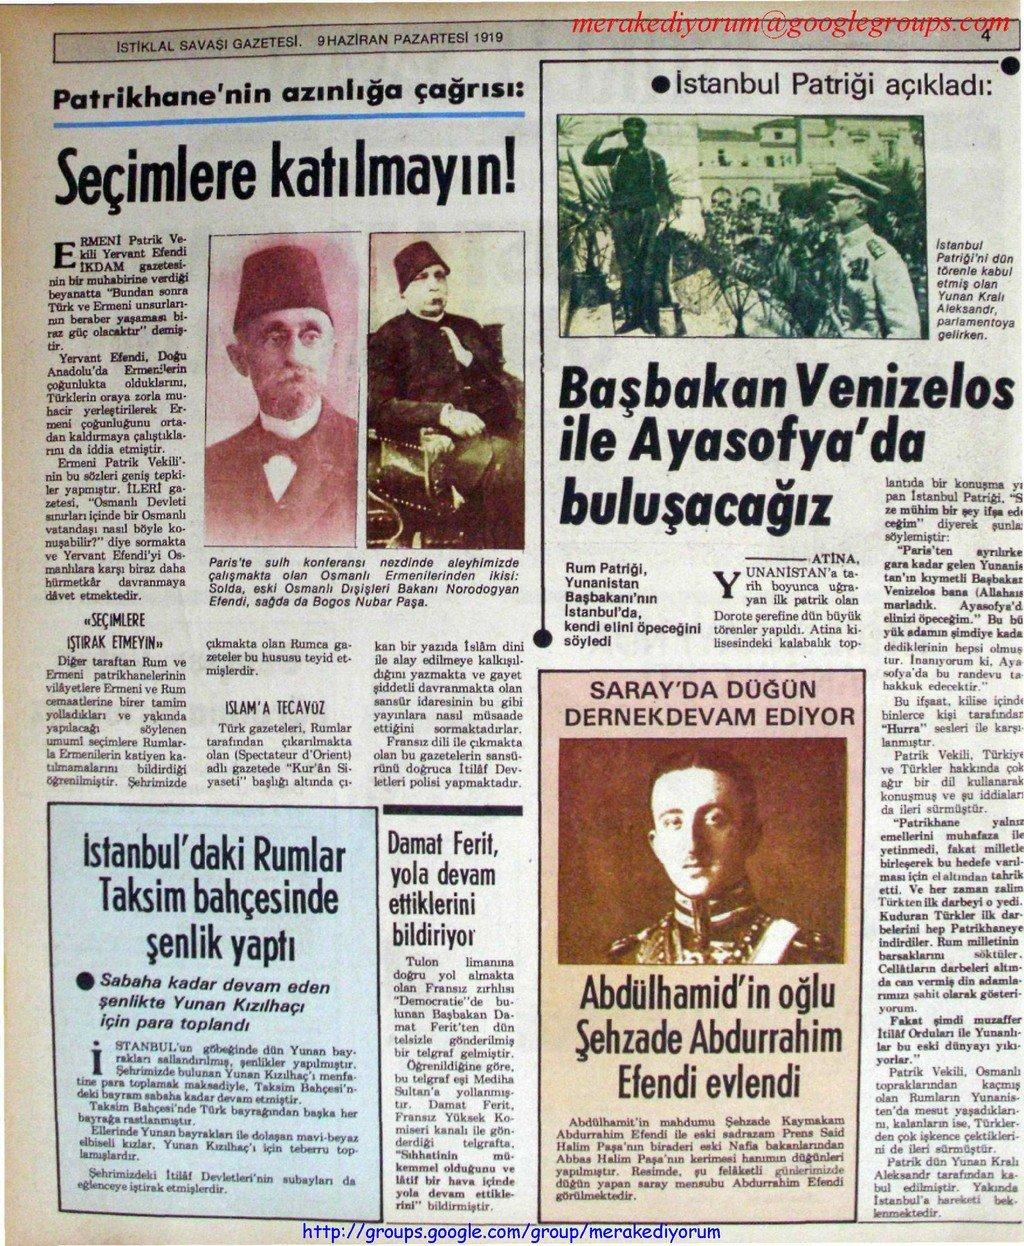 istiklal savaşı gazetesi - 9 haziran 1919